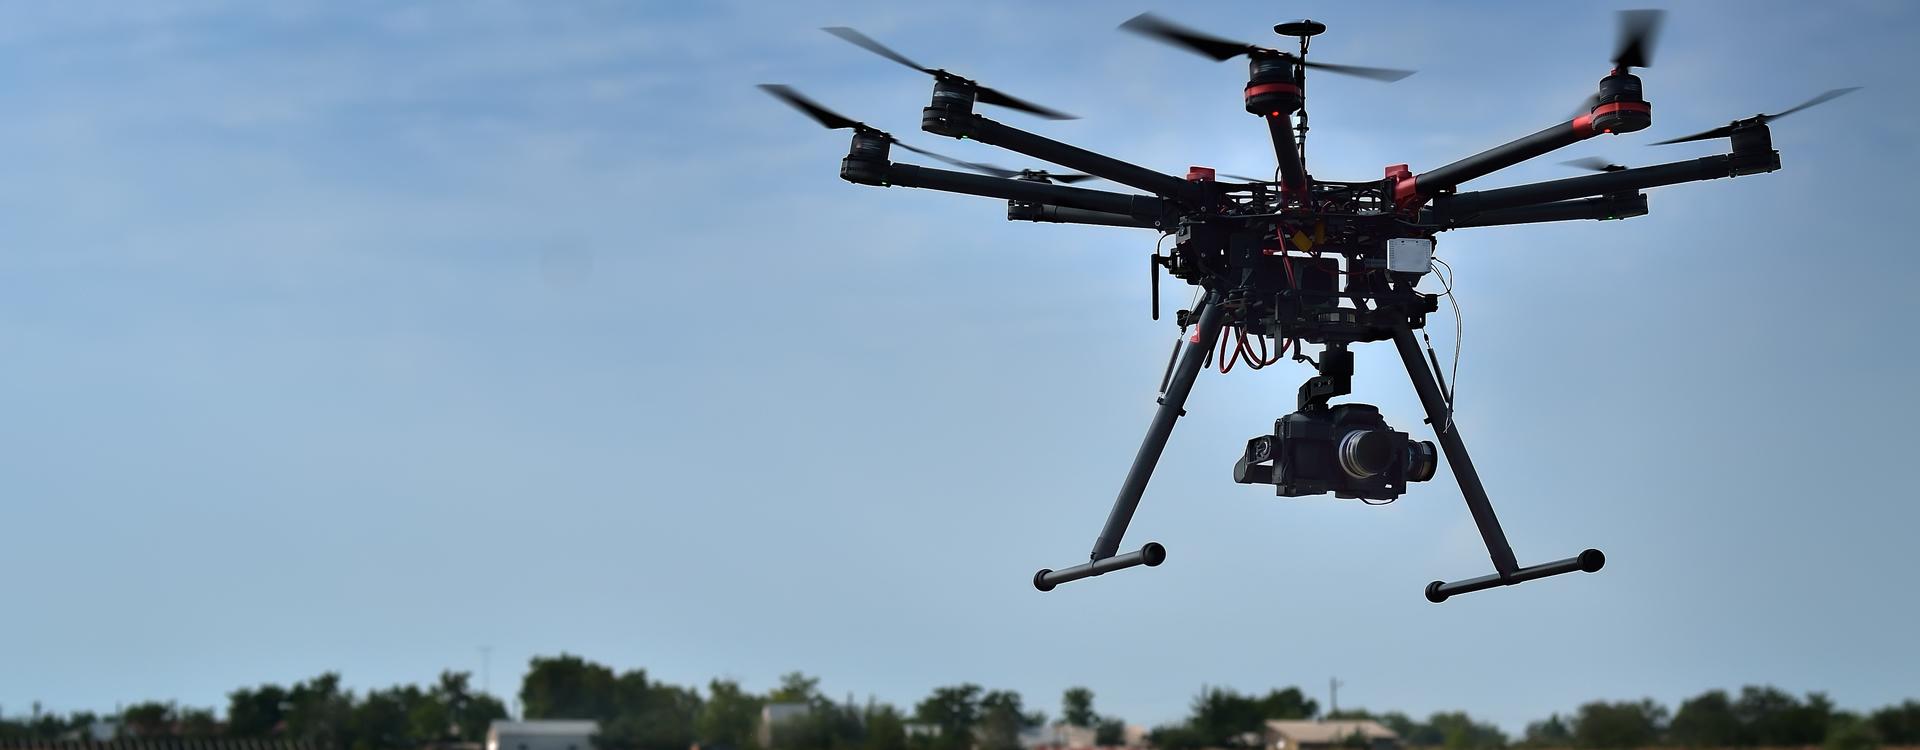 droneshot